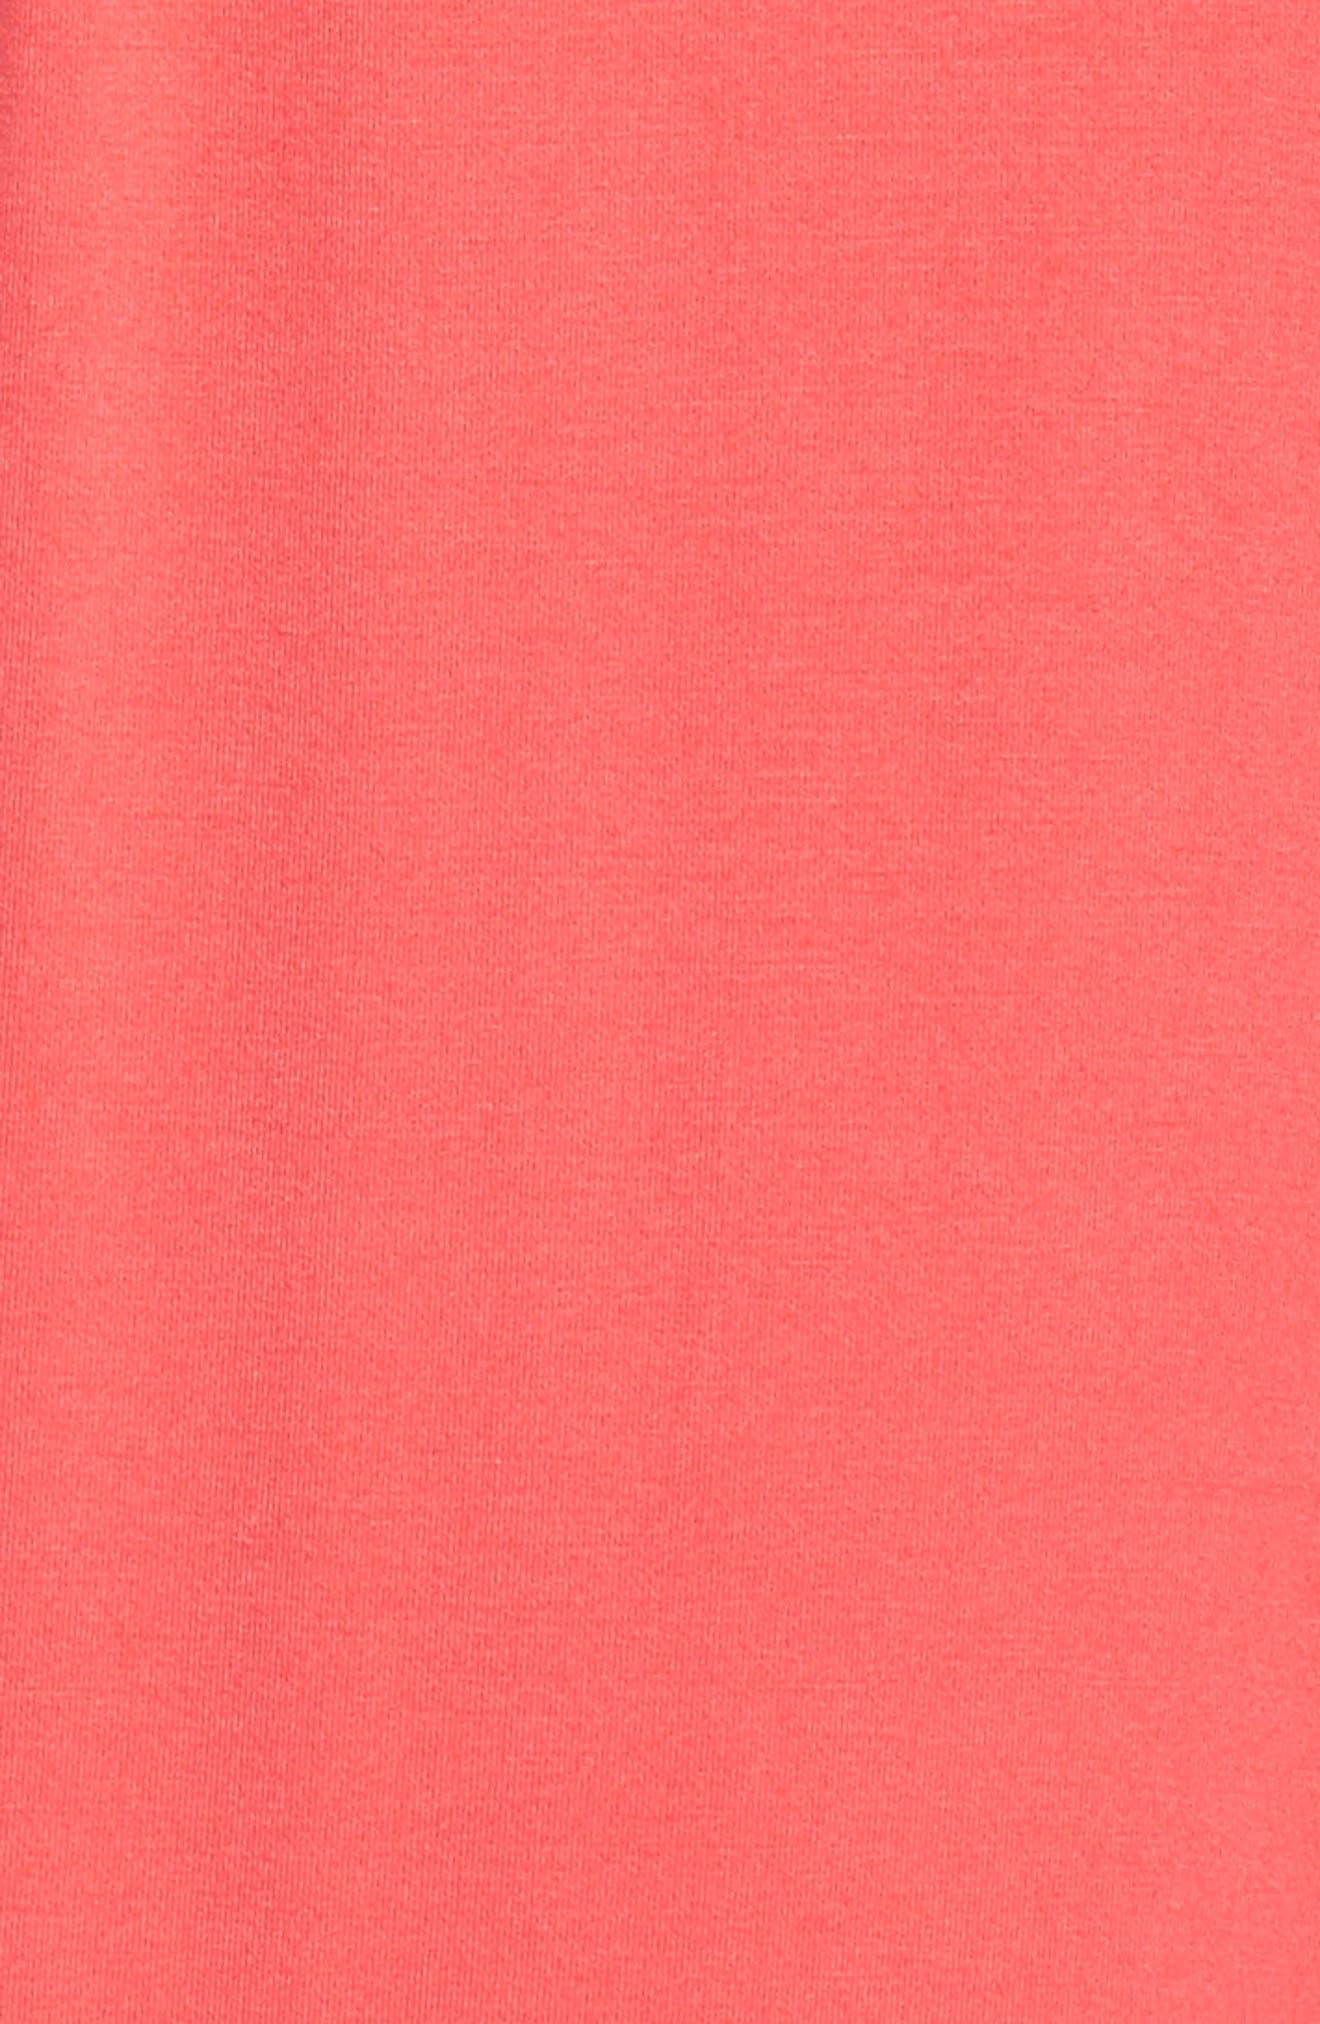 Deep V-Neck Jersey Maxi Dress,                             Alternate thumbnail 5, color,                             CORAL